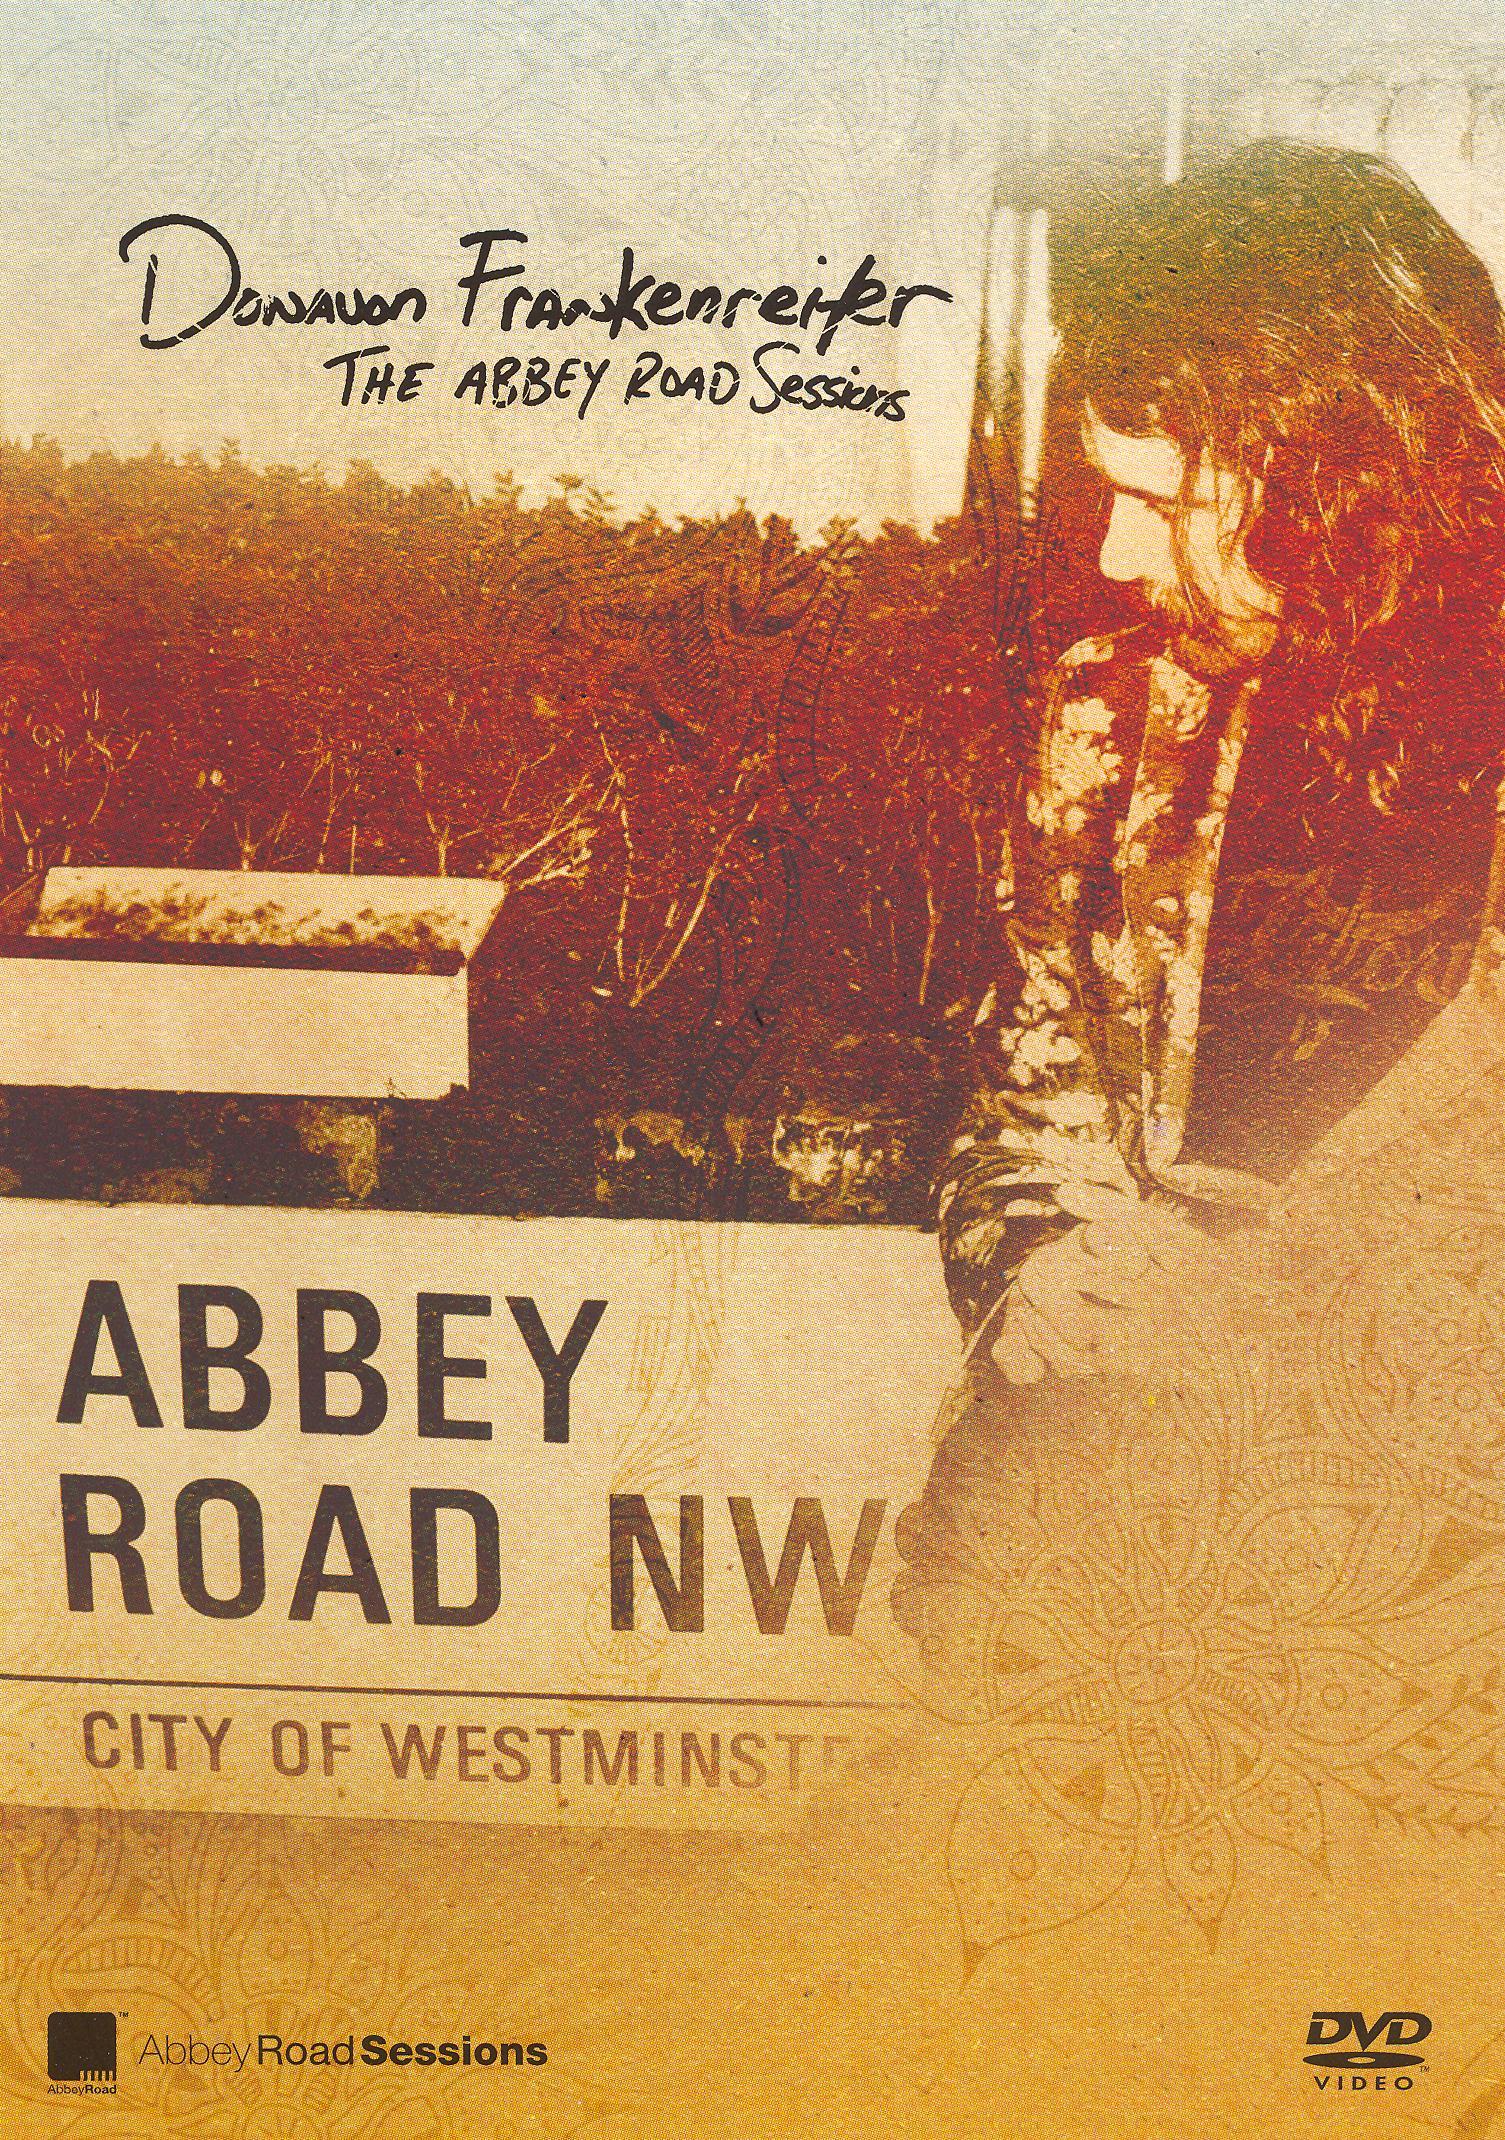 Donovan Frankenreiter: Abbey Road Sessions